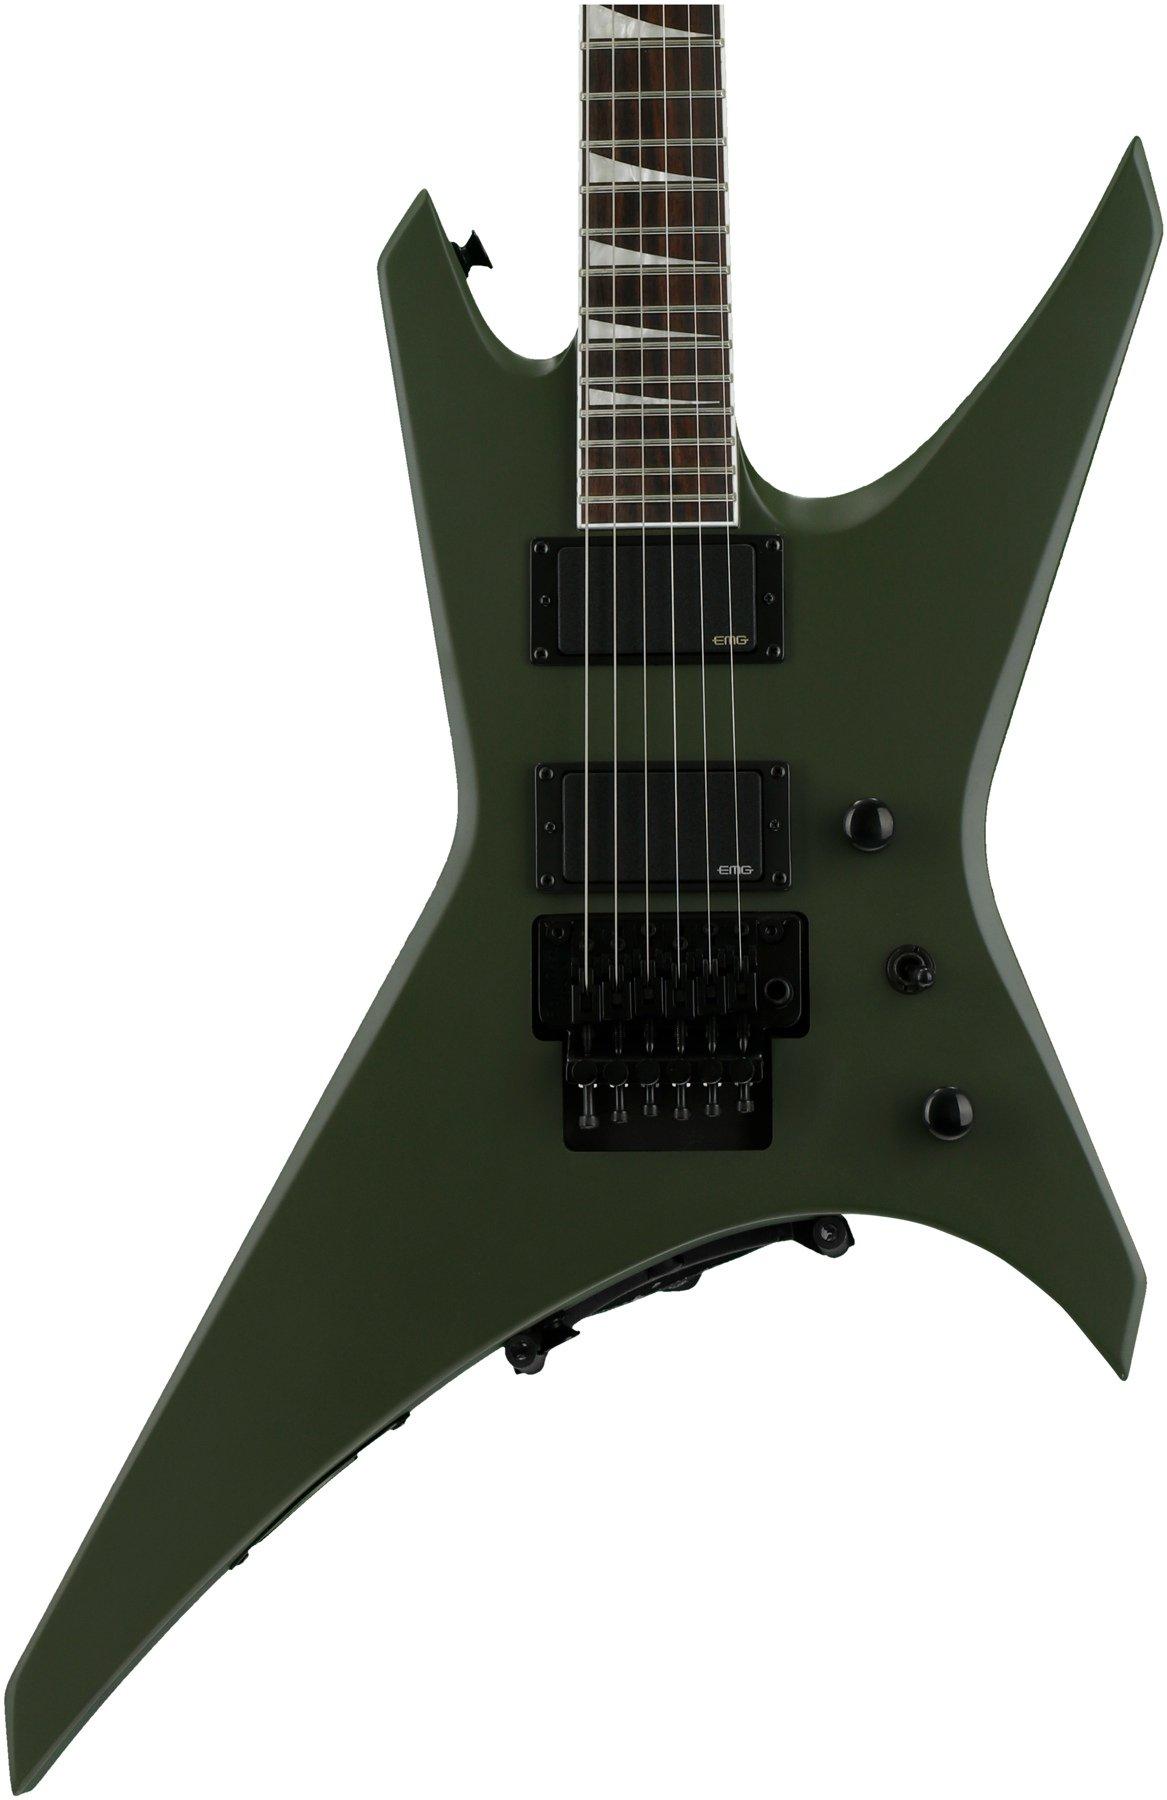 Jackson Wrxmg X Series Warrior Matte Army Drab Sweetwater Guitar With Emg Pickup Wiring Image 1